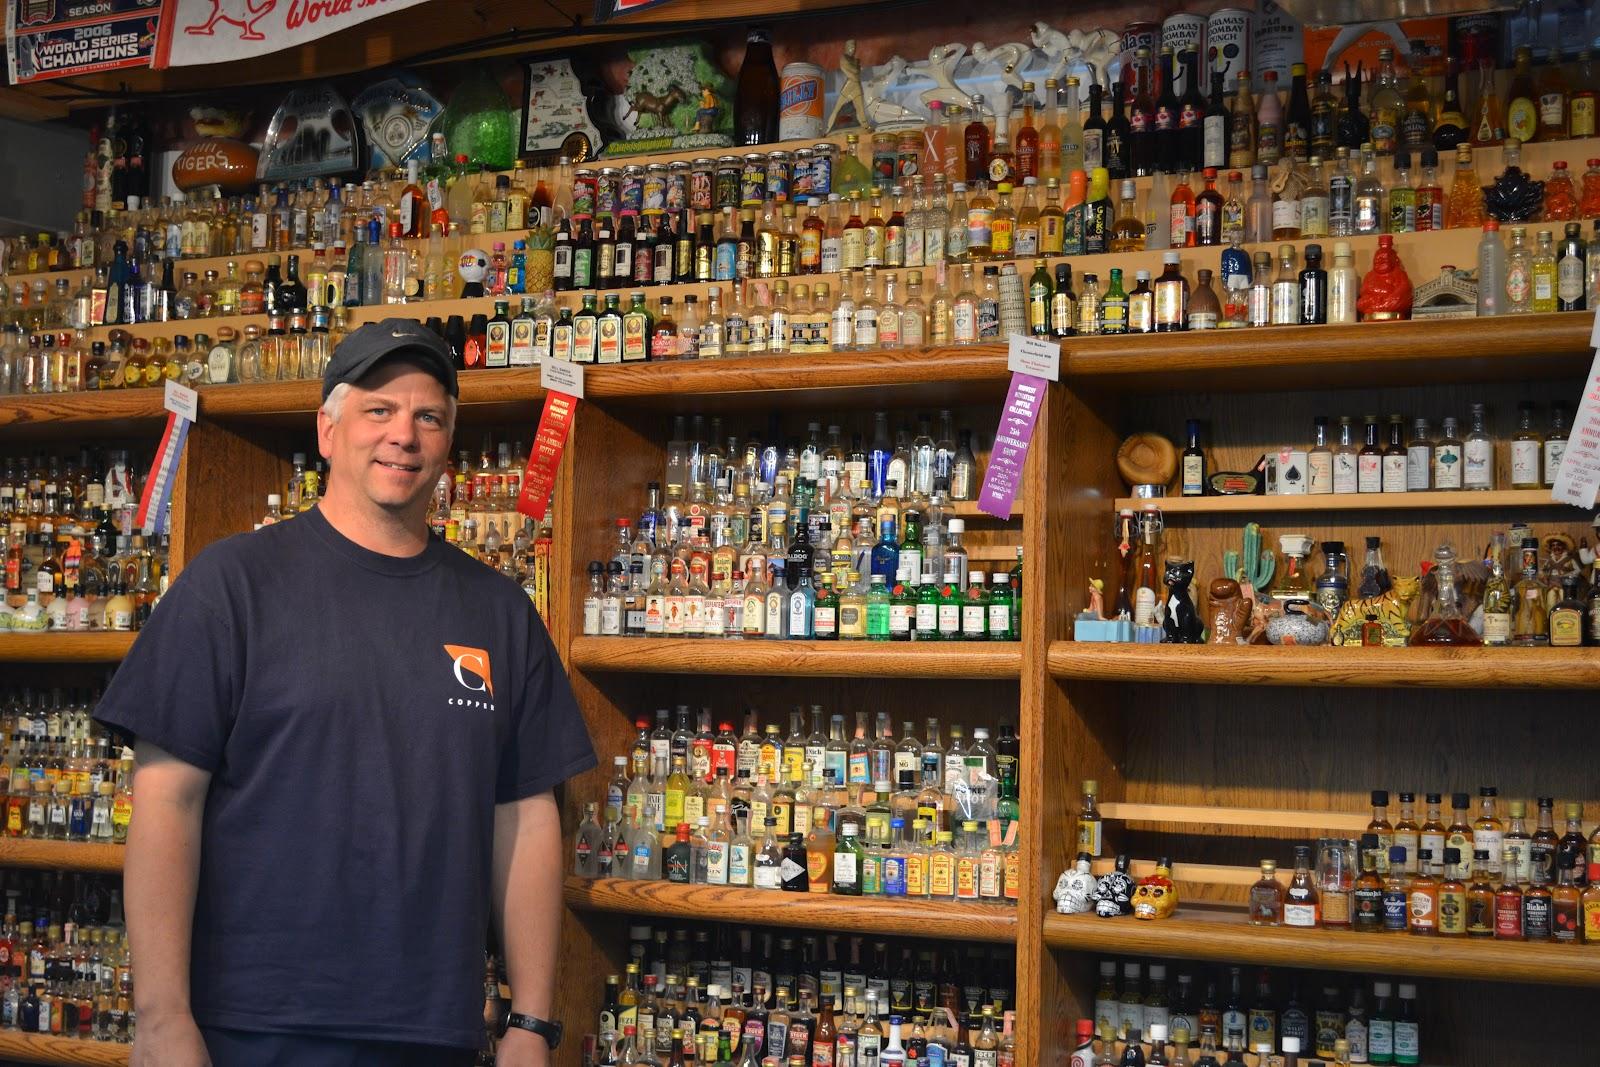 Bar De Parede besides Howard Miller Chancellor Corner Curio Cabi  680 503 together with Dining Room Shelves as well 4388030k0e689073 furthermore Miniature Liquor Bottles. on liquor shelf display